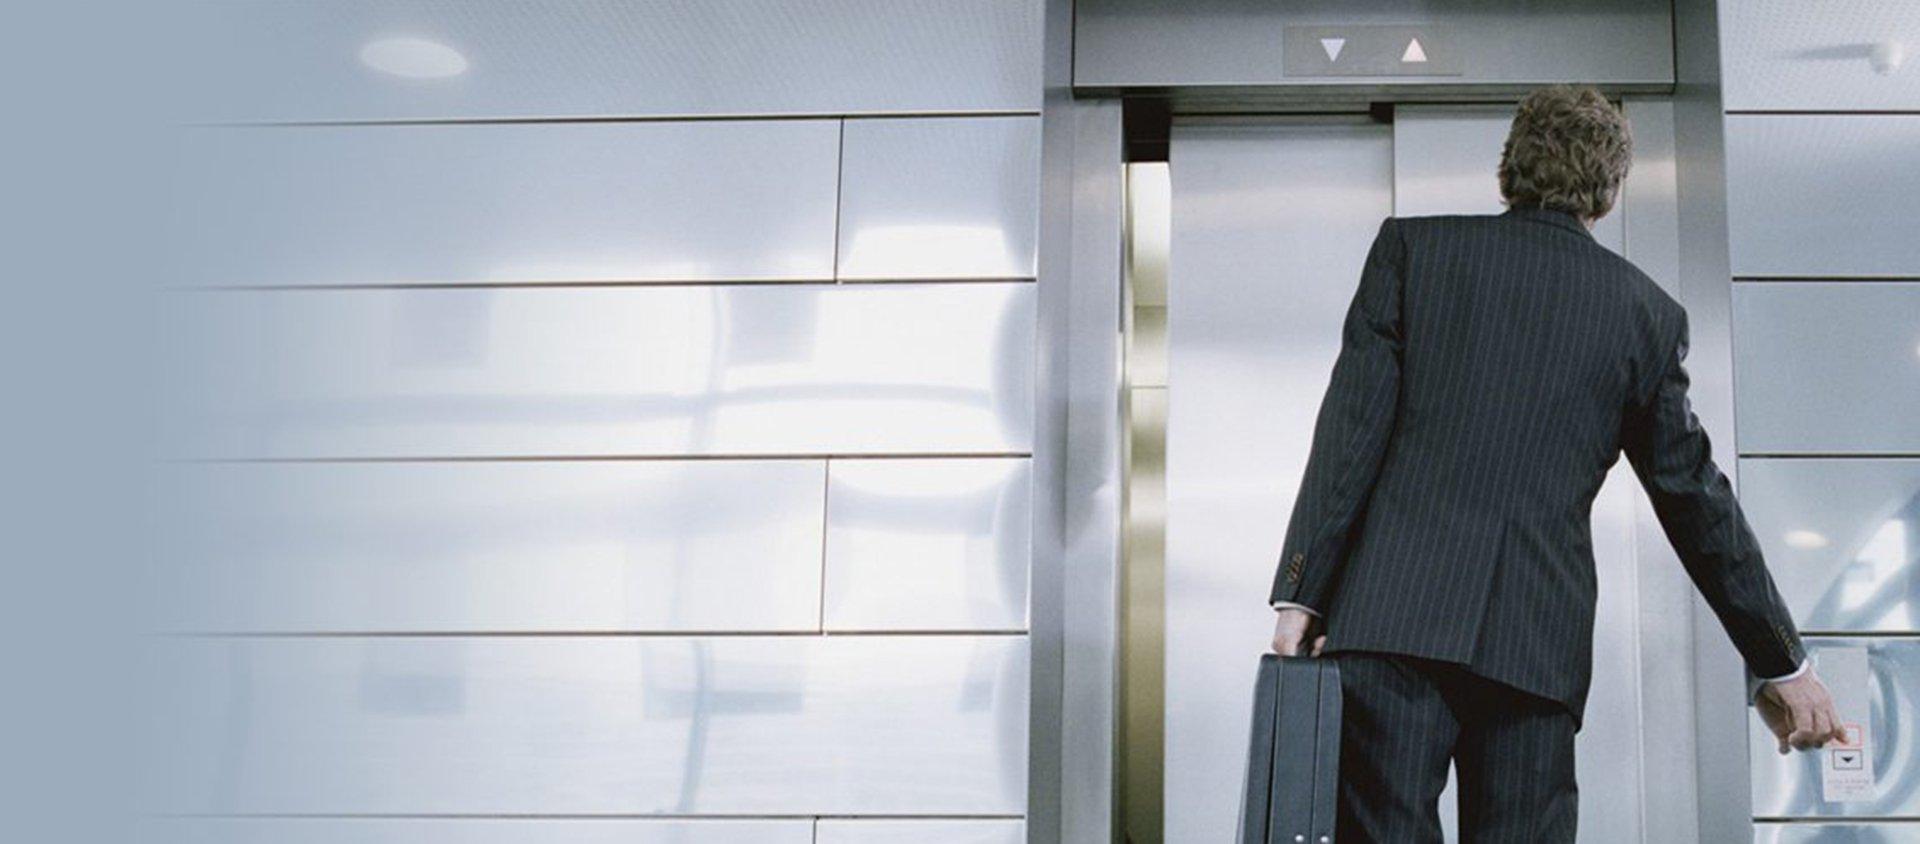 asansore-binen-adam